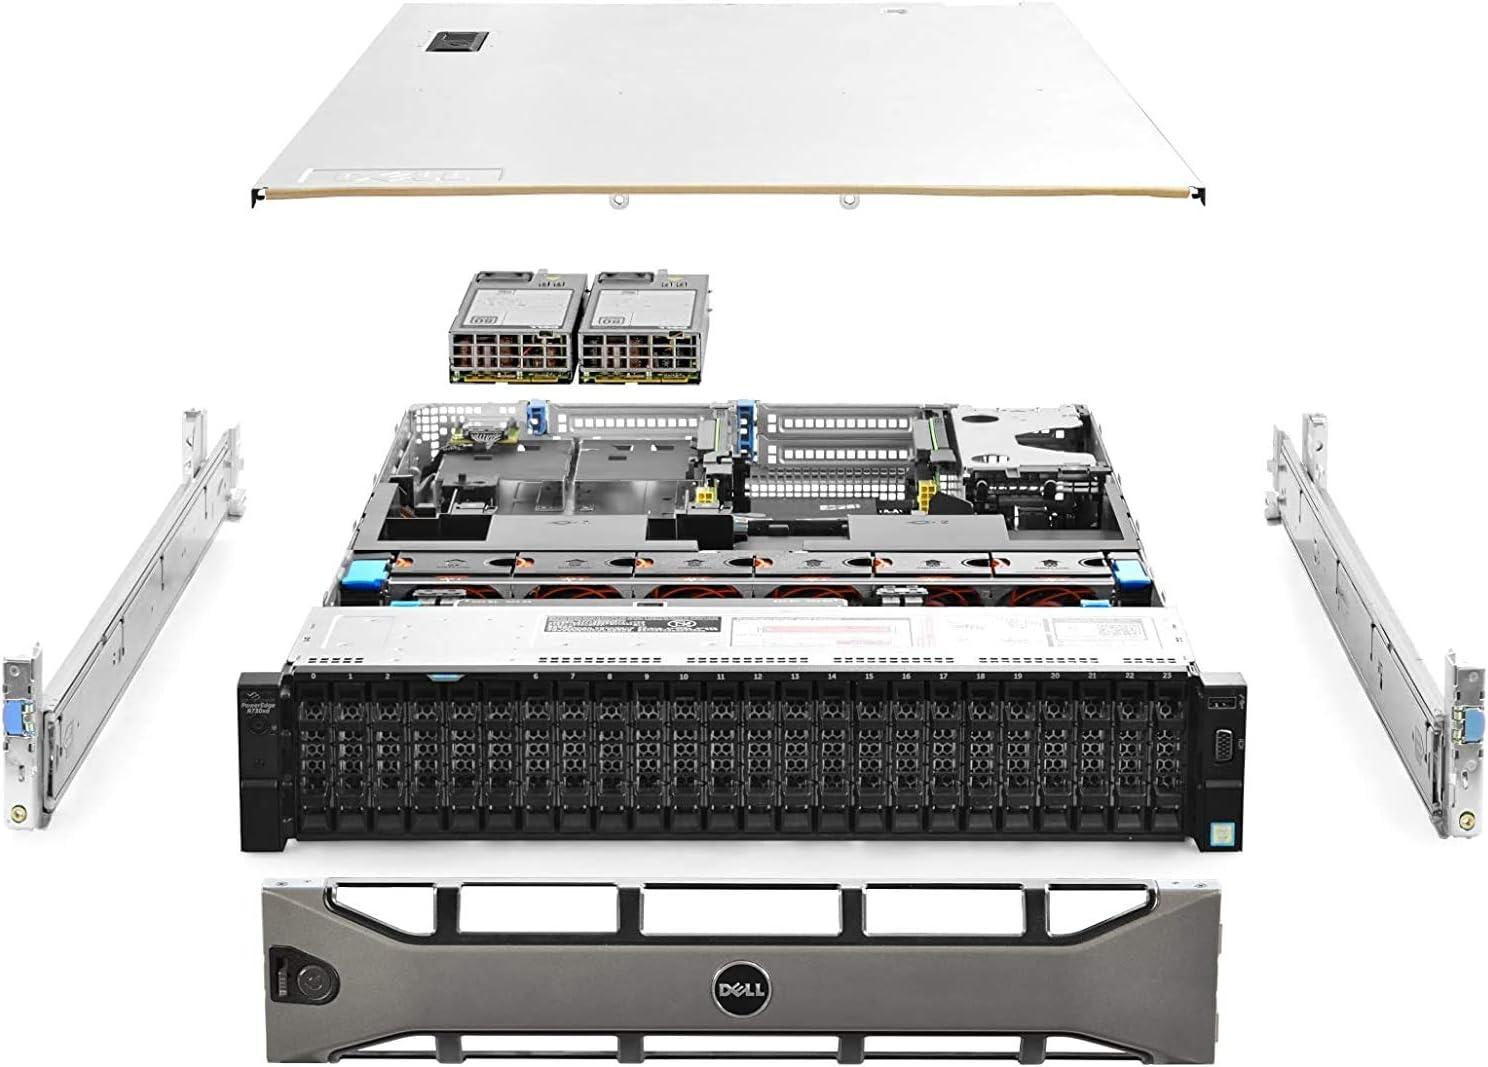 Dell PowerEdge R730xd Server 24B SFF, 2x Intel Xeon E5-2690 v4 2.6Ghz (28-cores Total), 256GB DDR4 RAM, 10x 1.8TB 10K SAS 12Gb/s, H730P 2GB RAID, 2x 10Gb + 2x 1Gb, Rails, Windows Server 2019 (Renewed)